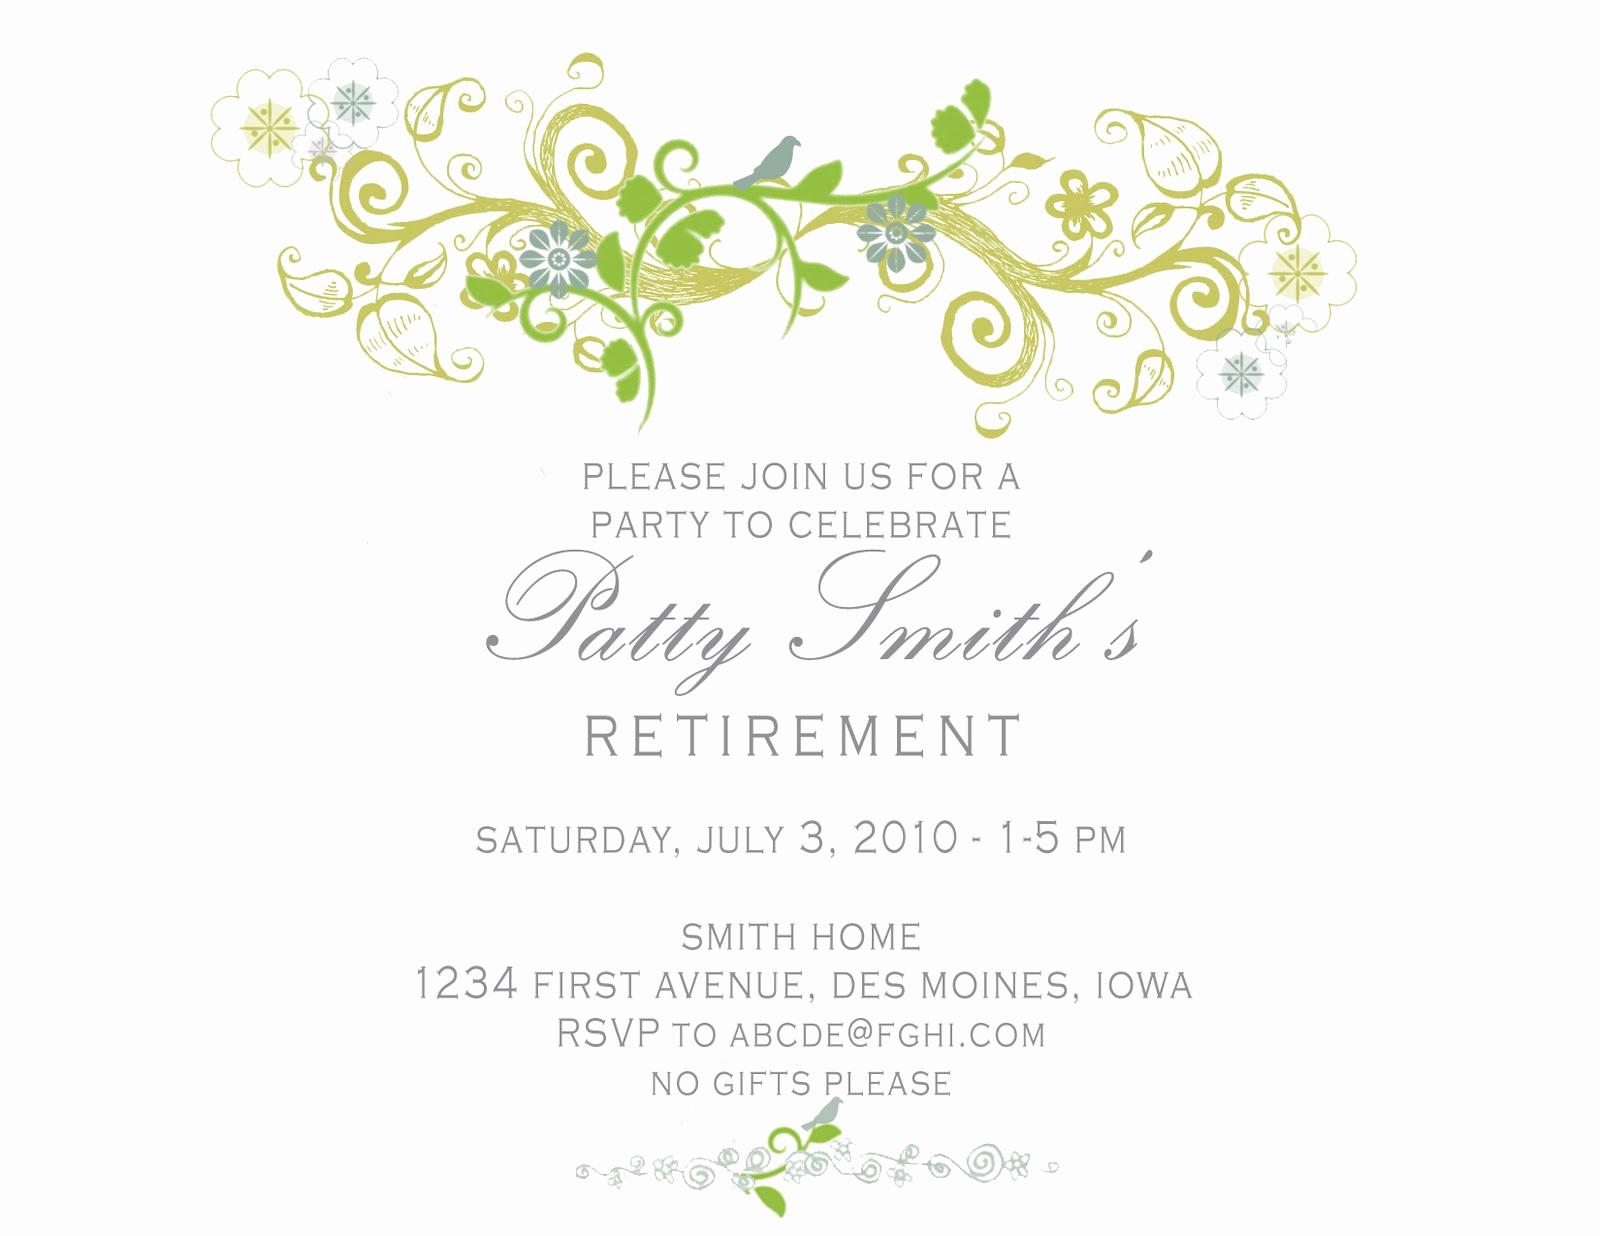 Retirement Party Invitation Templates Fresh Idesign A Retirement Party Invitation